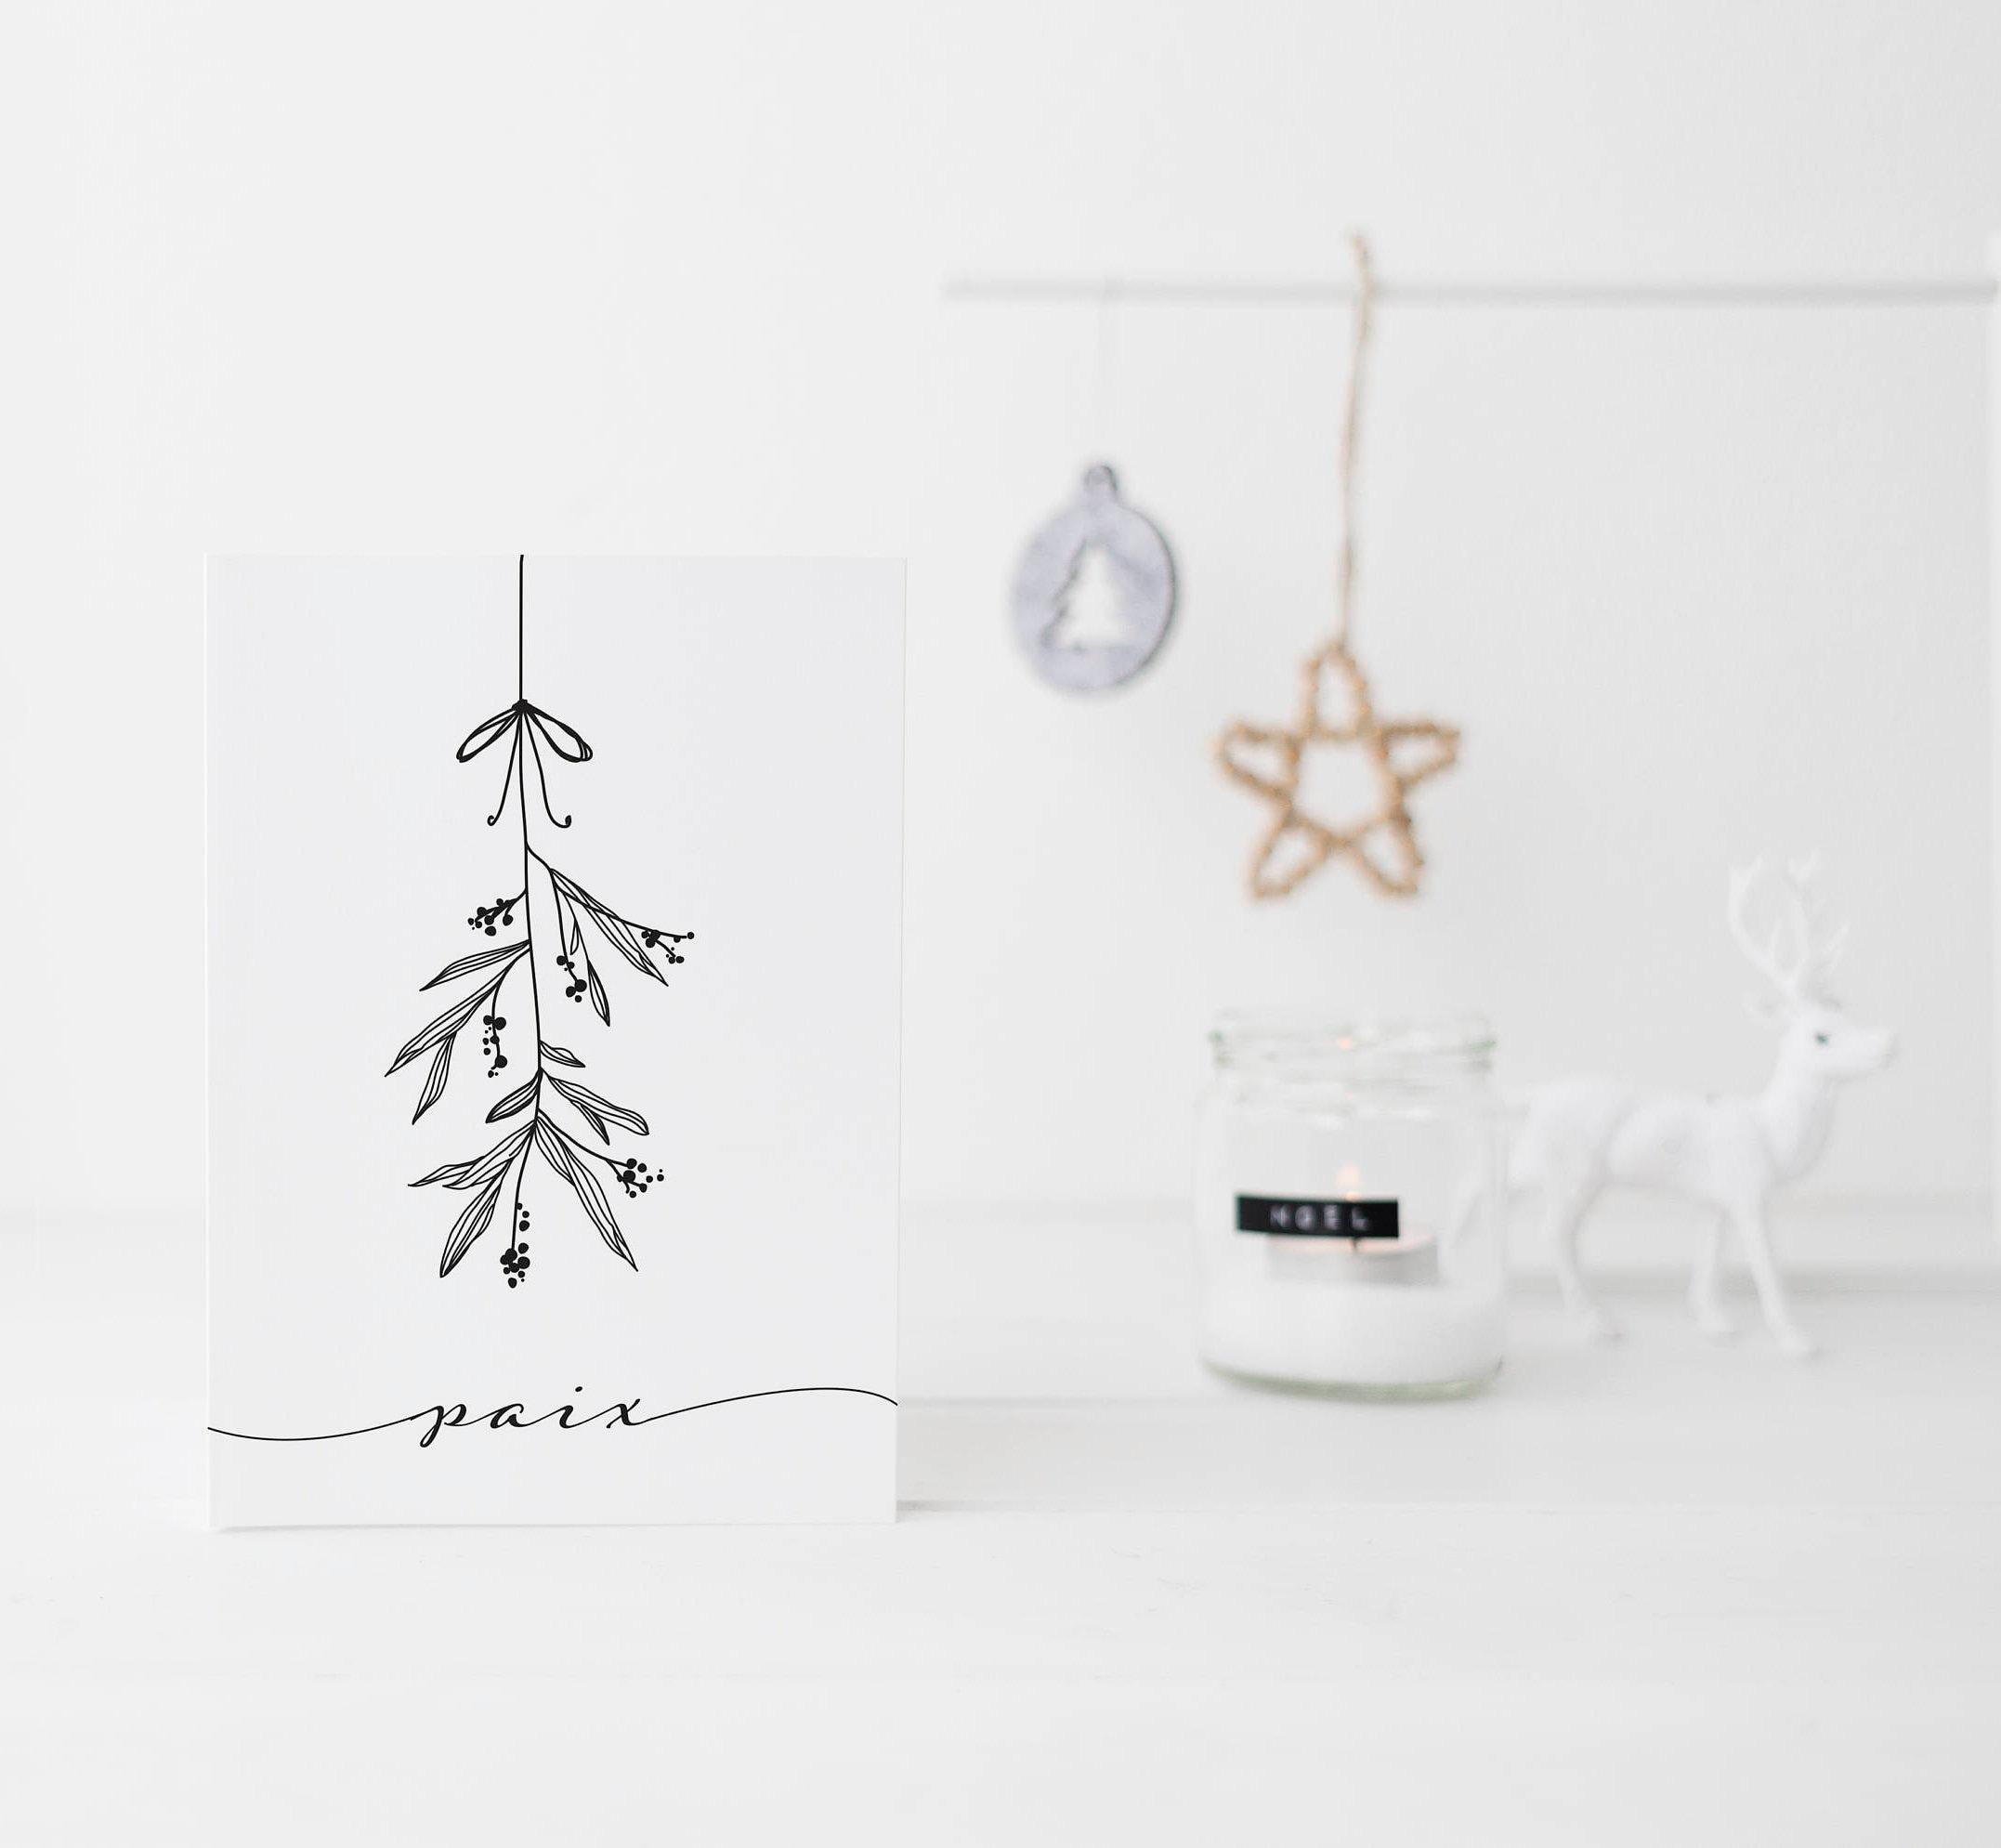 christmas stationary rustic christmas stationary traditional | Etsy